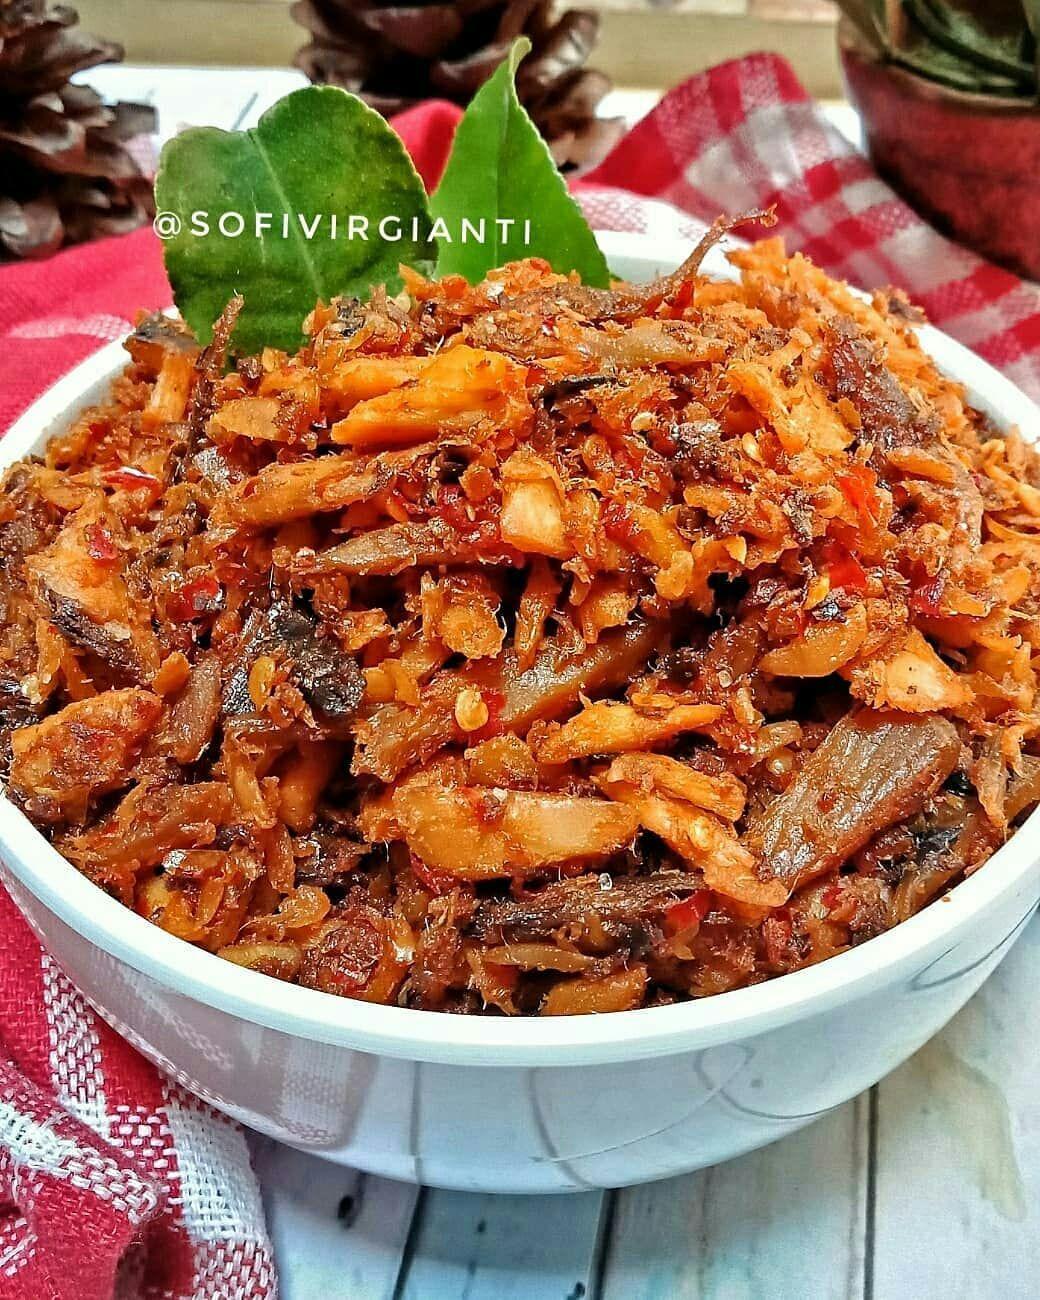 Cakalang Suwir Pedas By Sofivirgianti Bahan 1 Ekor Ikan Cakalang Me 750gr 4 Lbr D Healthy Chicken Recipes Easy Healthy Chicken Recipes Chicken Recipes